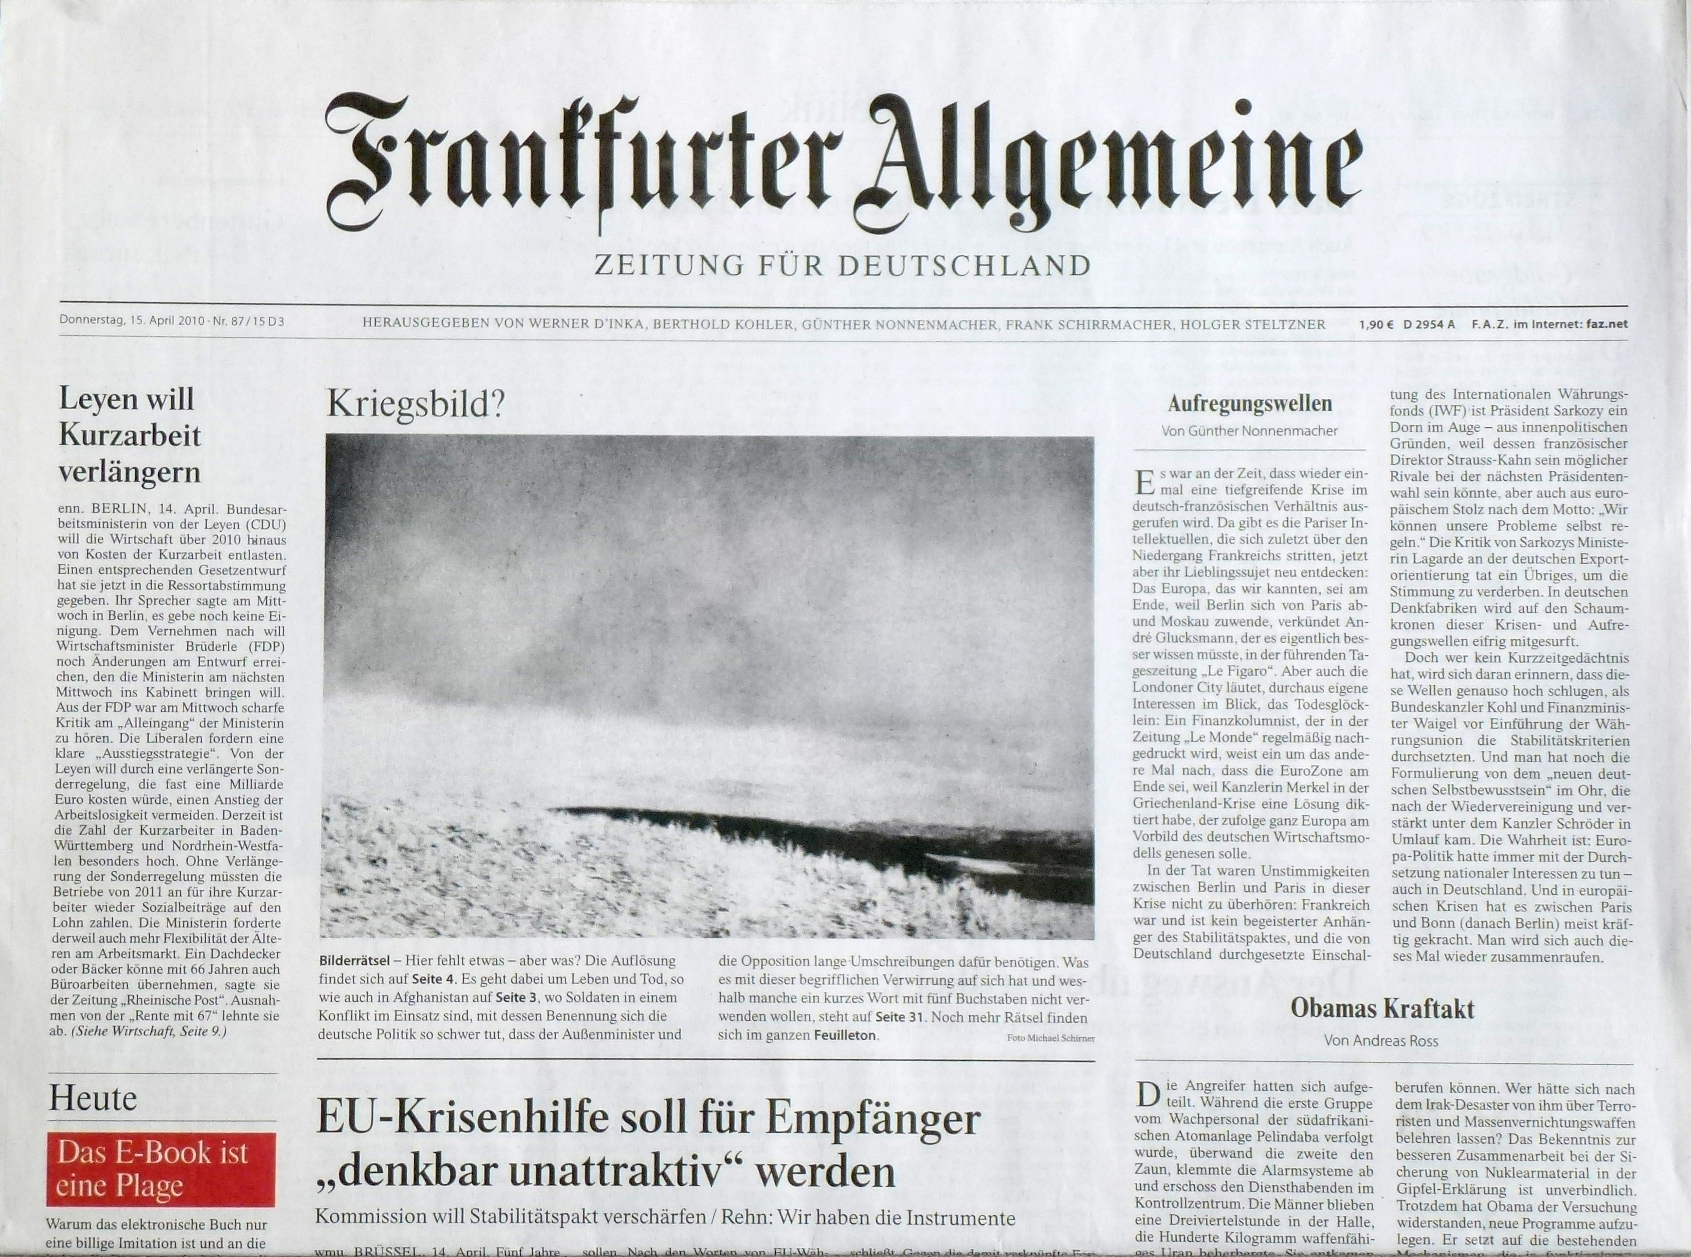 Frankfurter Allgemeine Zeitung, 15. April 2010, Nr. 87 / 15 D3